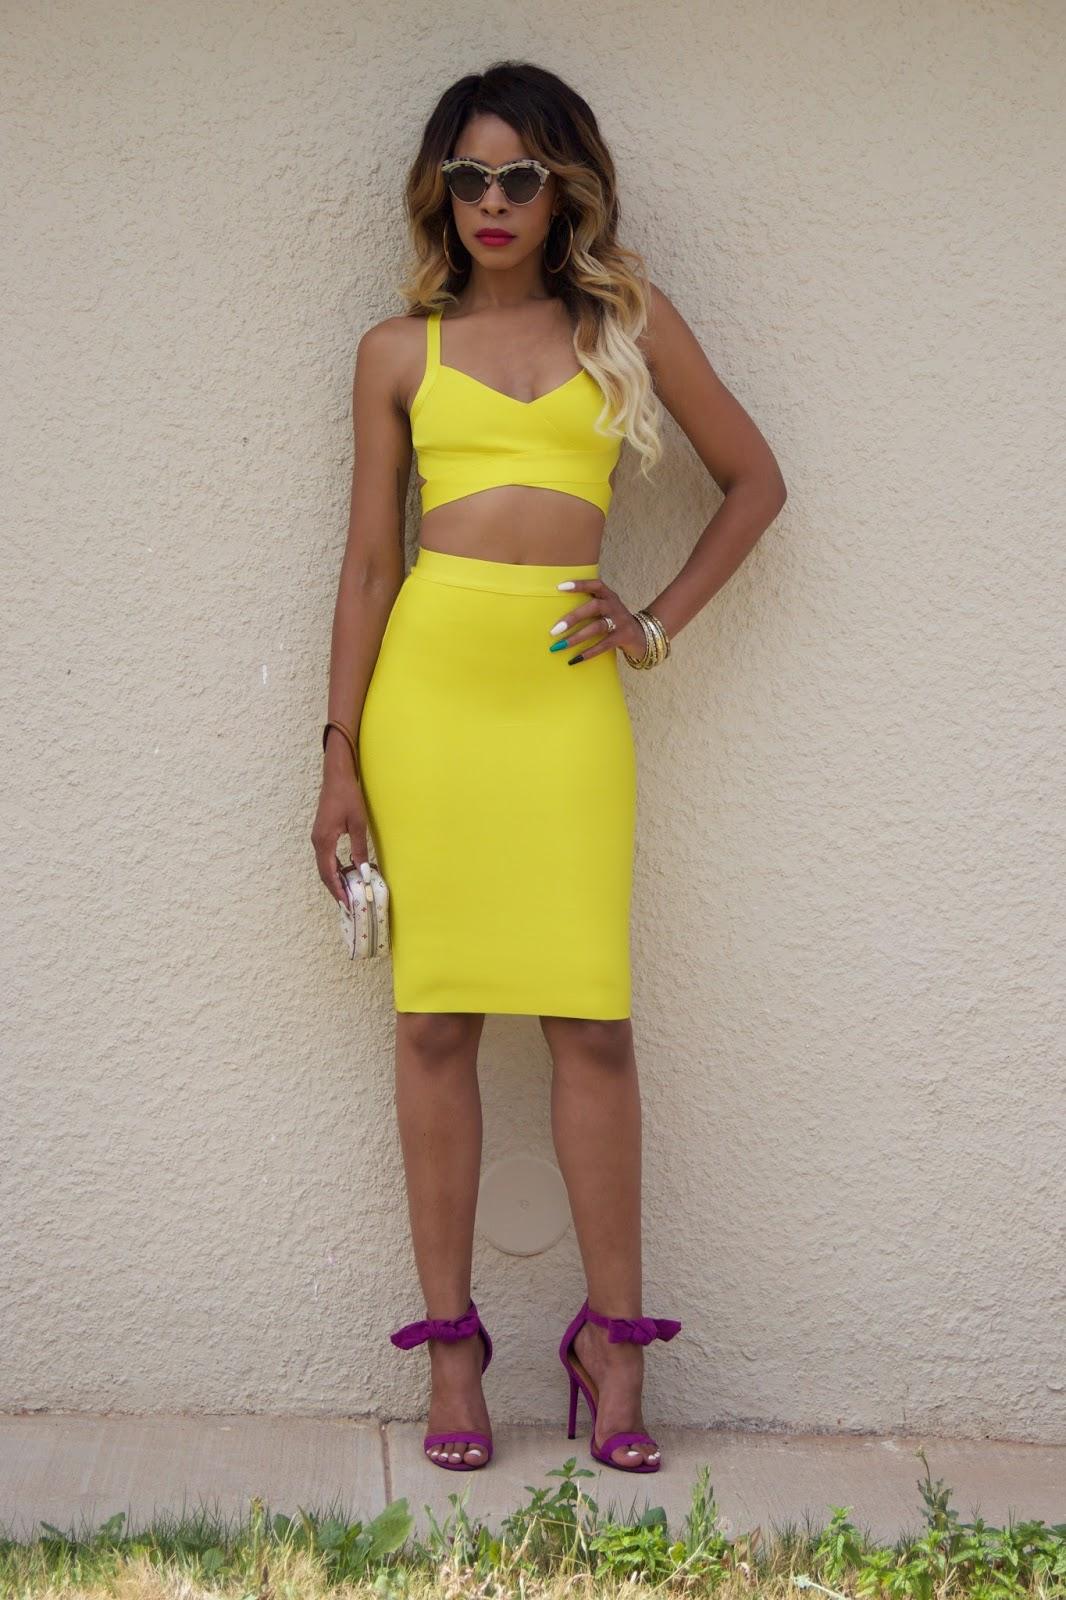 Black Girl Hairstyles For Teens: For Skinny Black Girls: 15 Slender Style Bloggers Who Kill